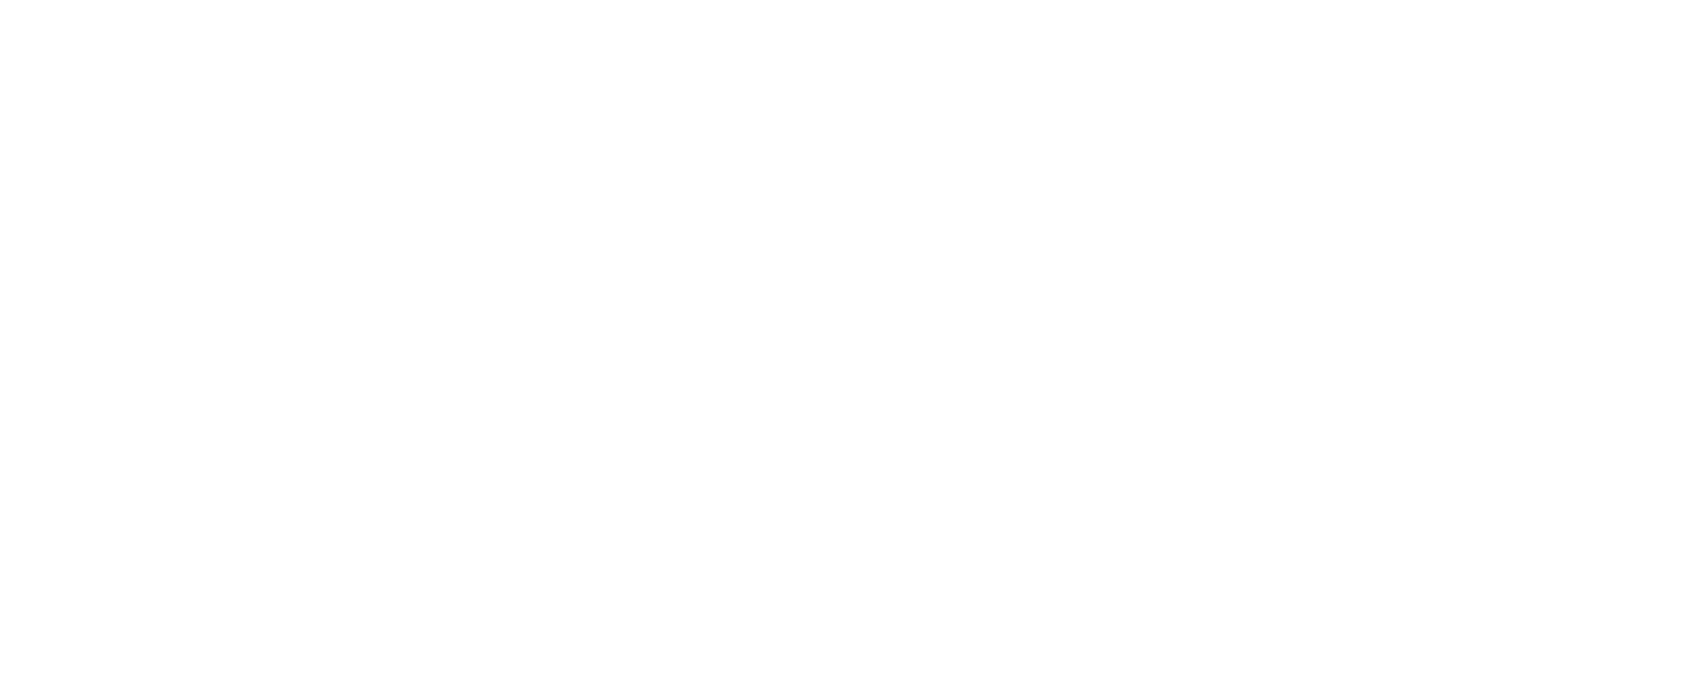 AAP American Academy of Pediatrics - Partner Promo Box 5